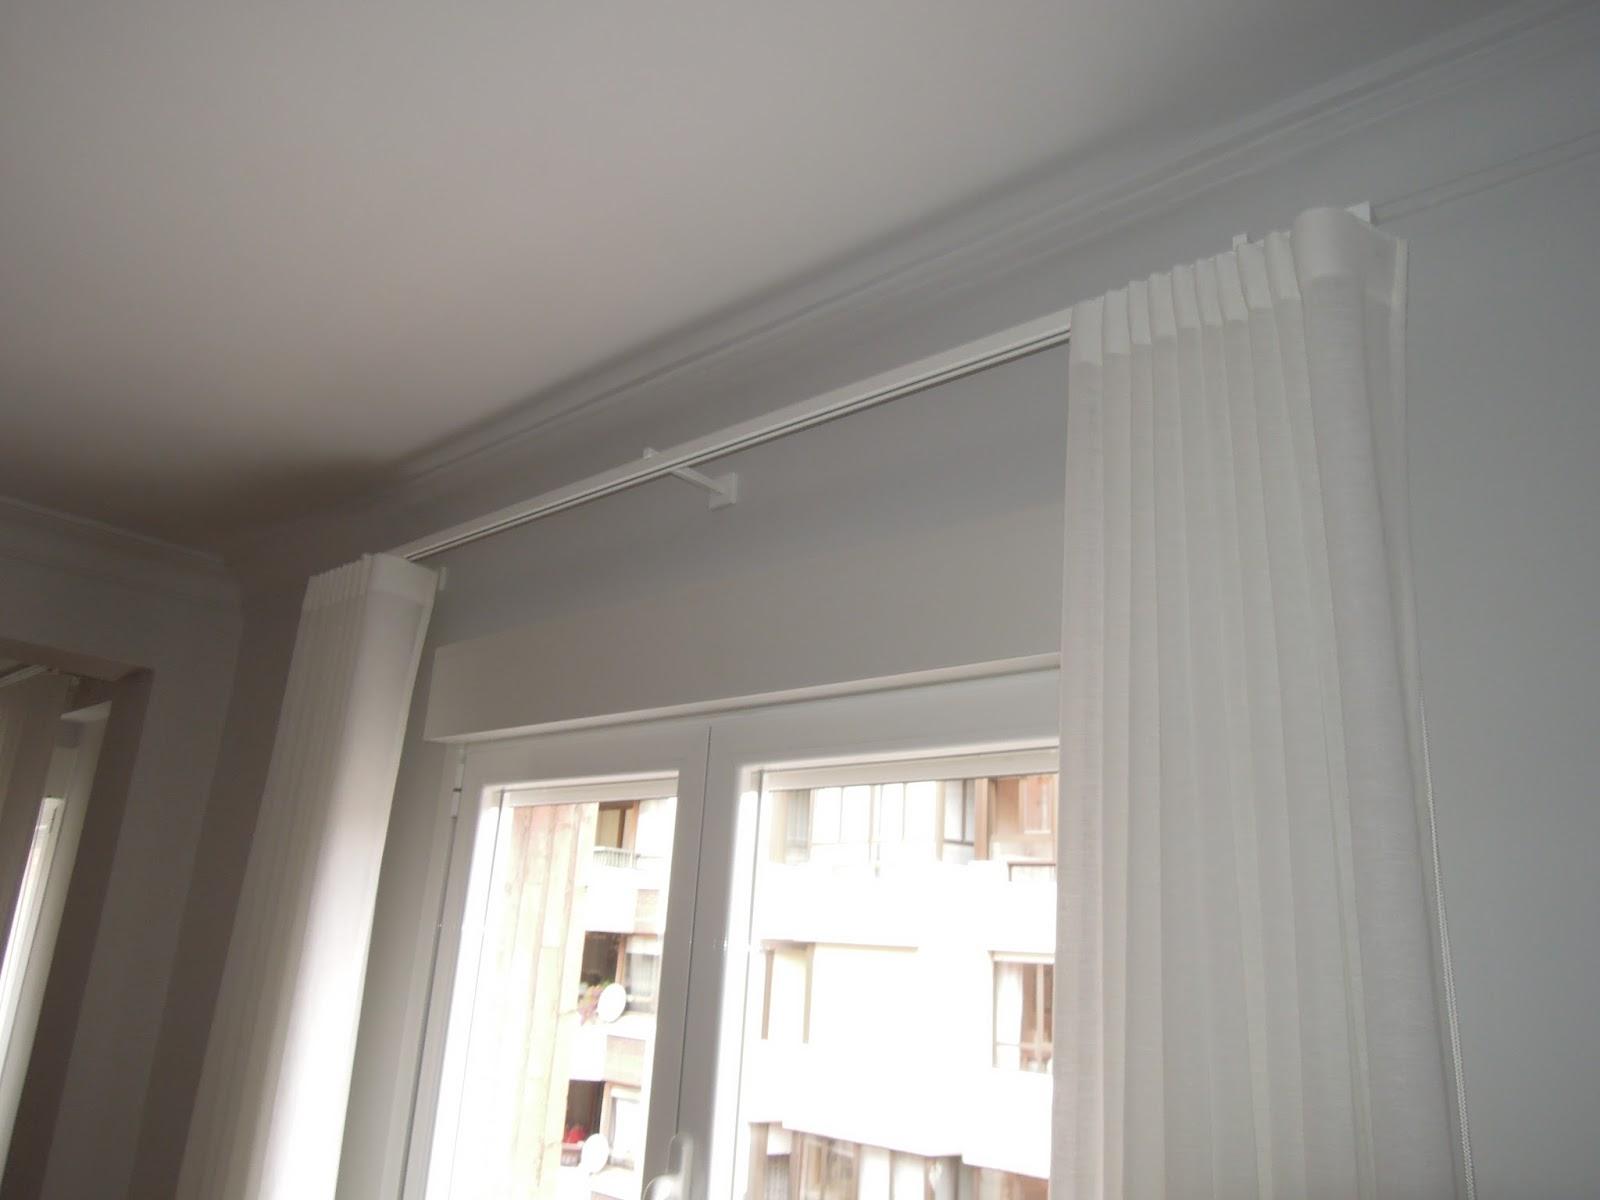 Cortinas para exterior leroy merlin flashup with cortinas - Rieles leroy merlin ...